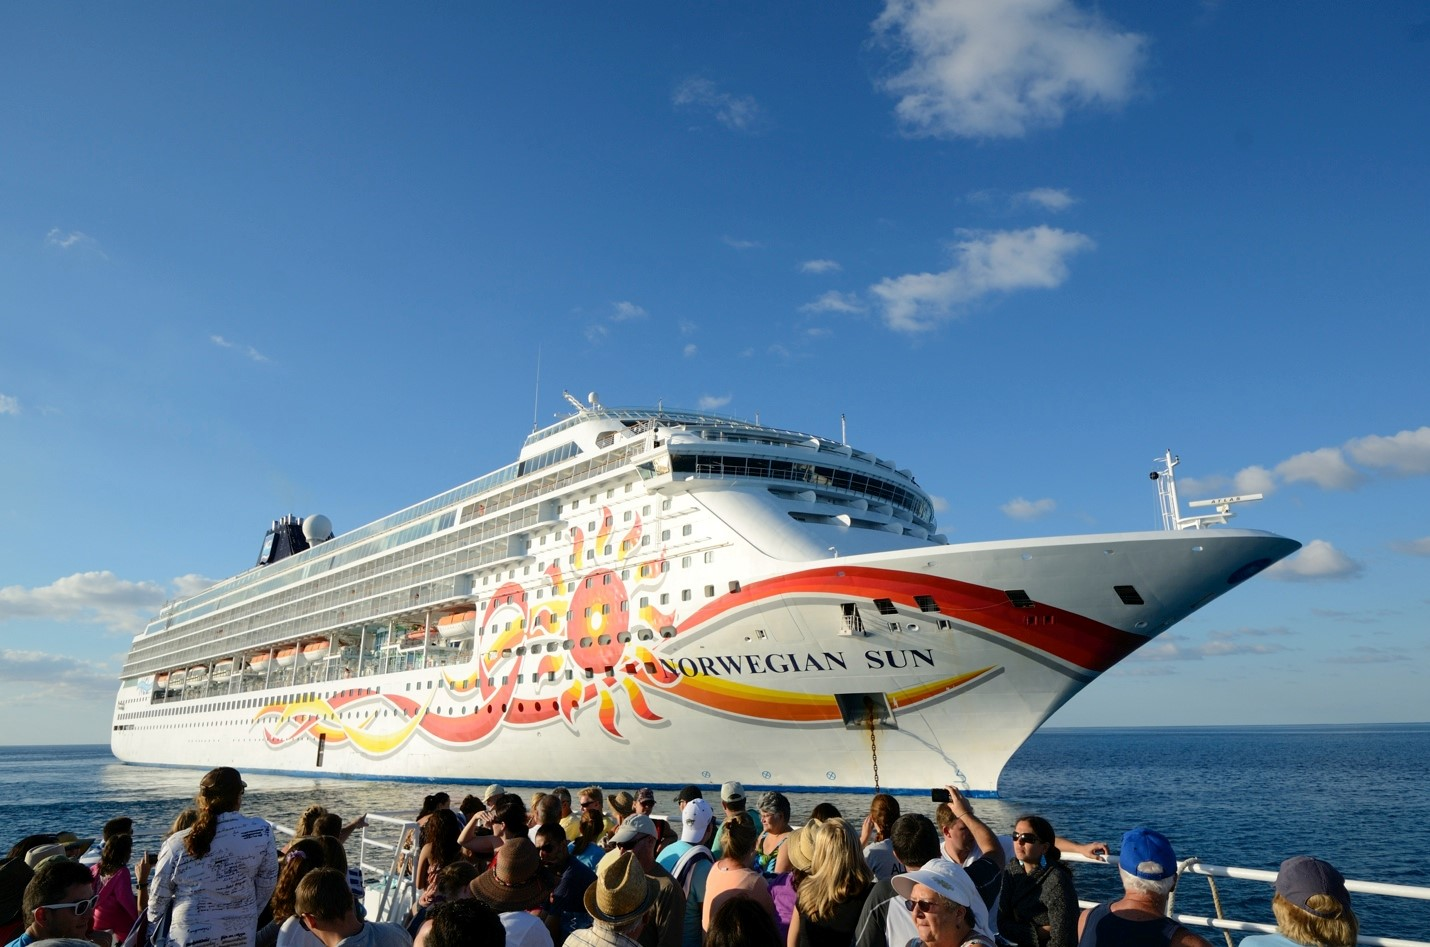 New Norwegian Cruise Ship Sets Social Media Record